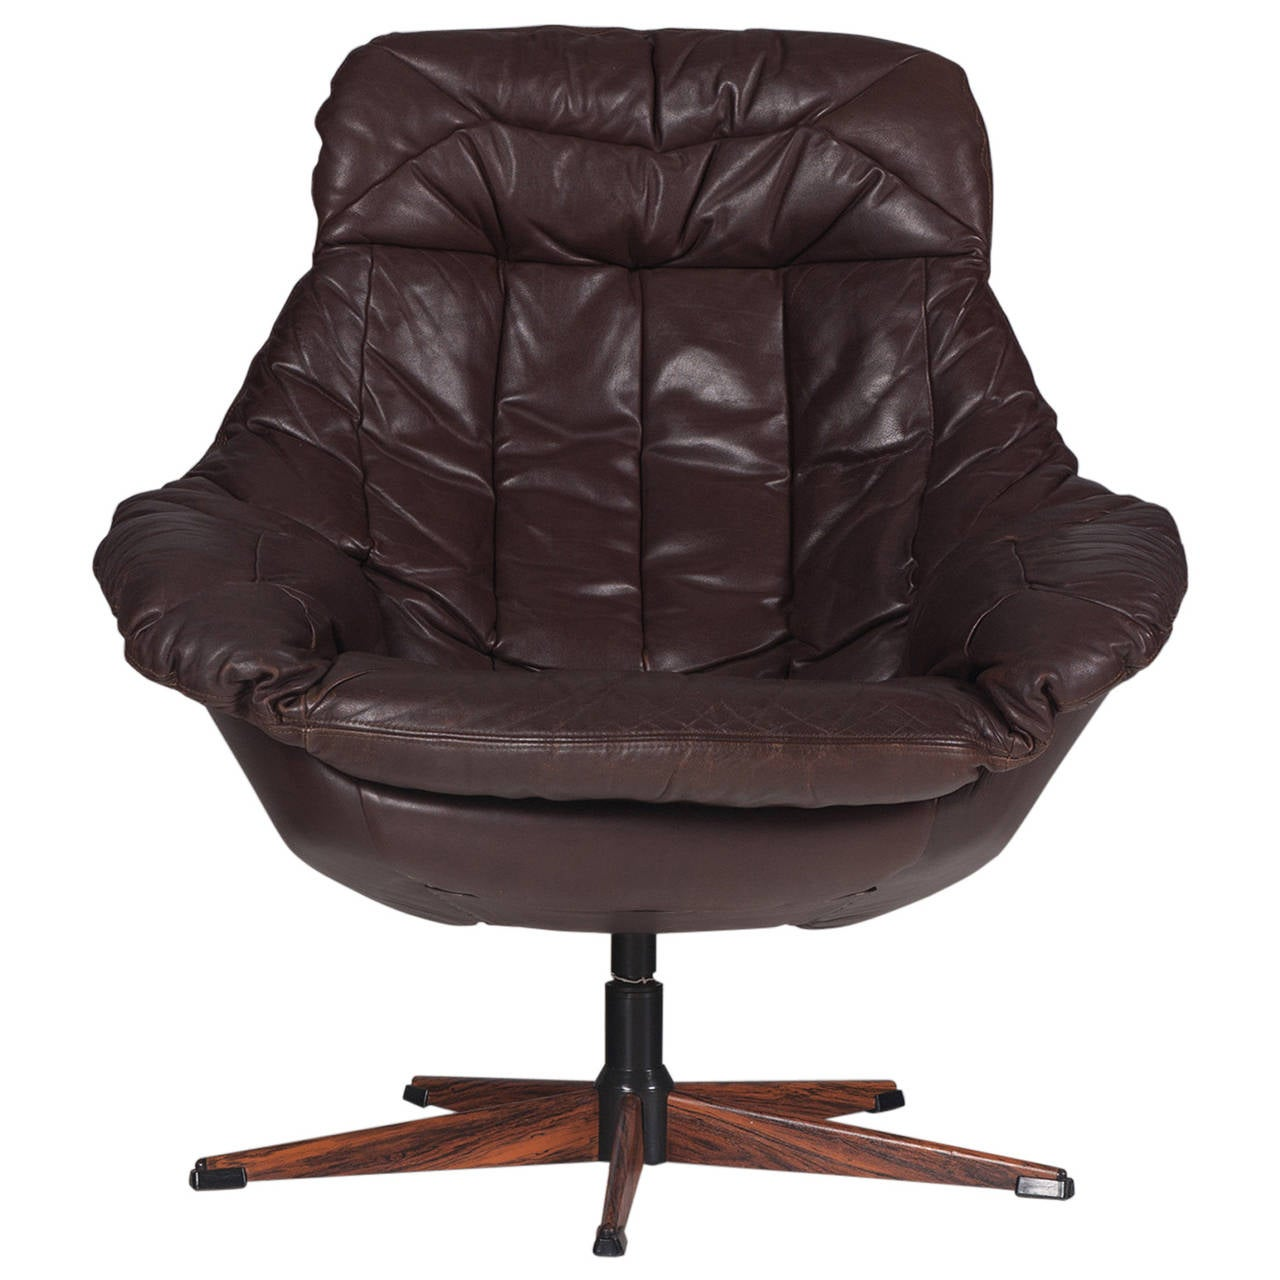 wh gunlocke chair stressless amazon danish brown leather swivel by h w klein 1970s at